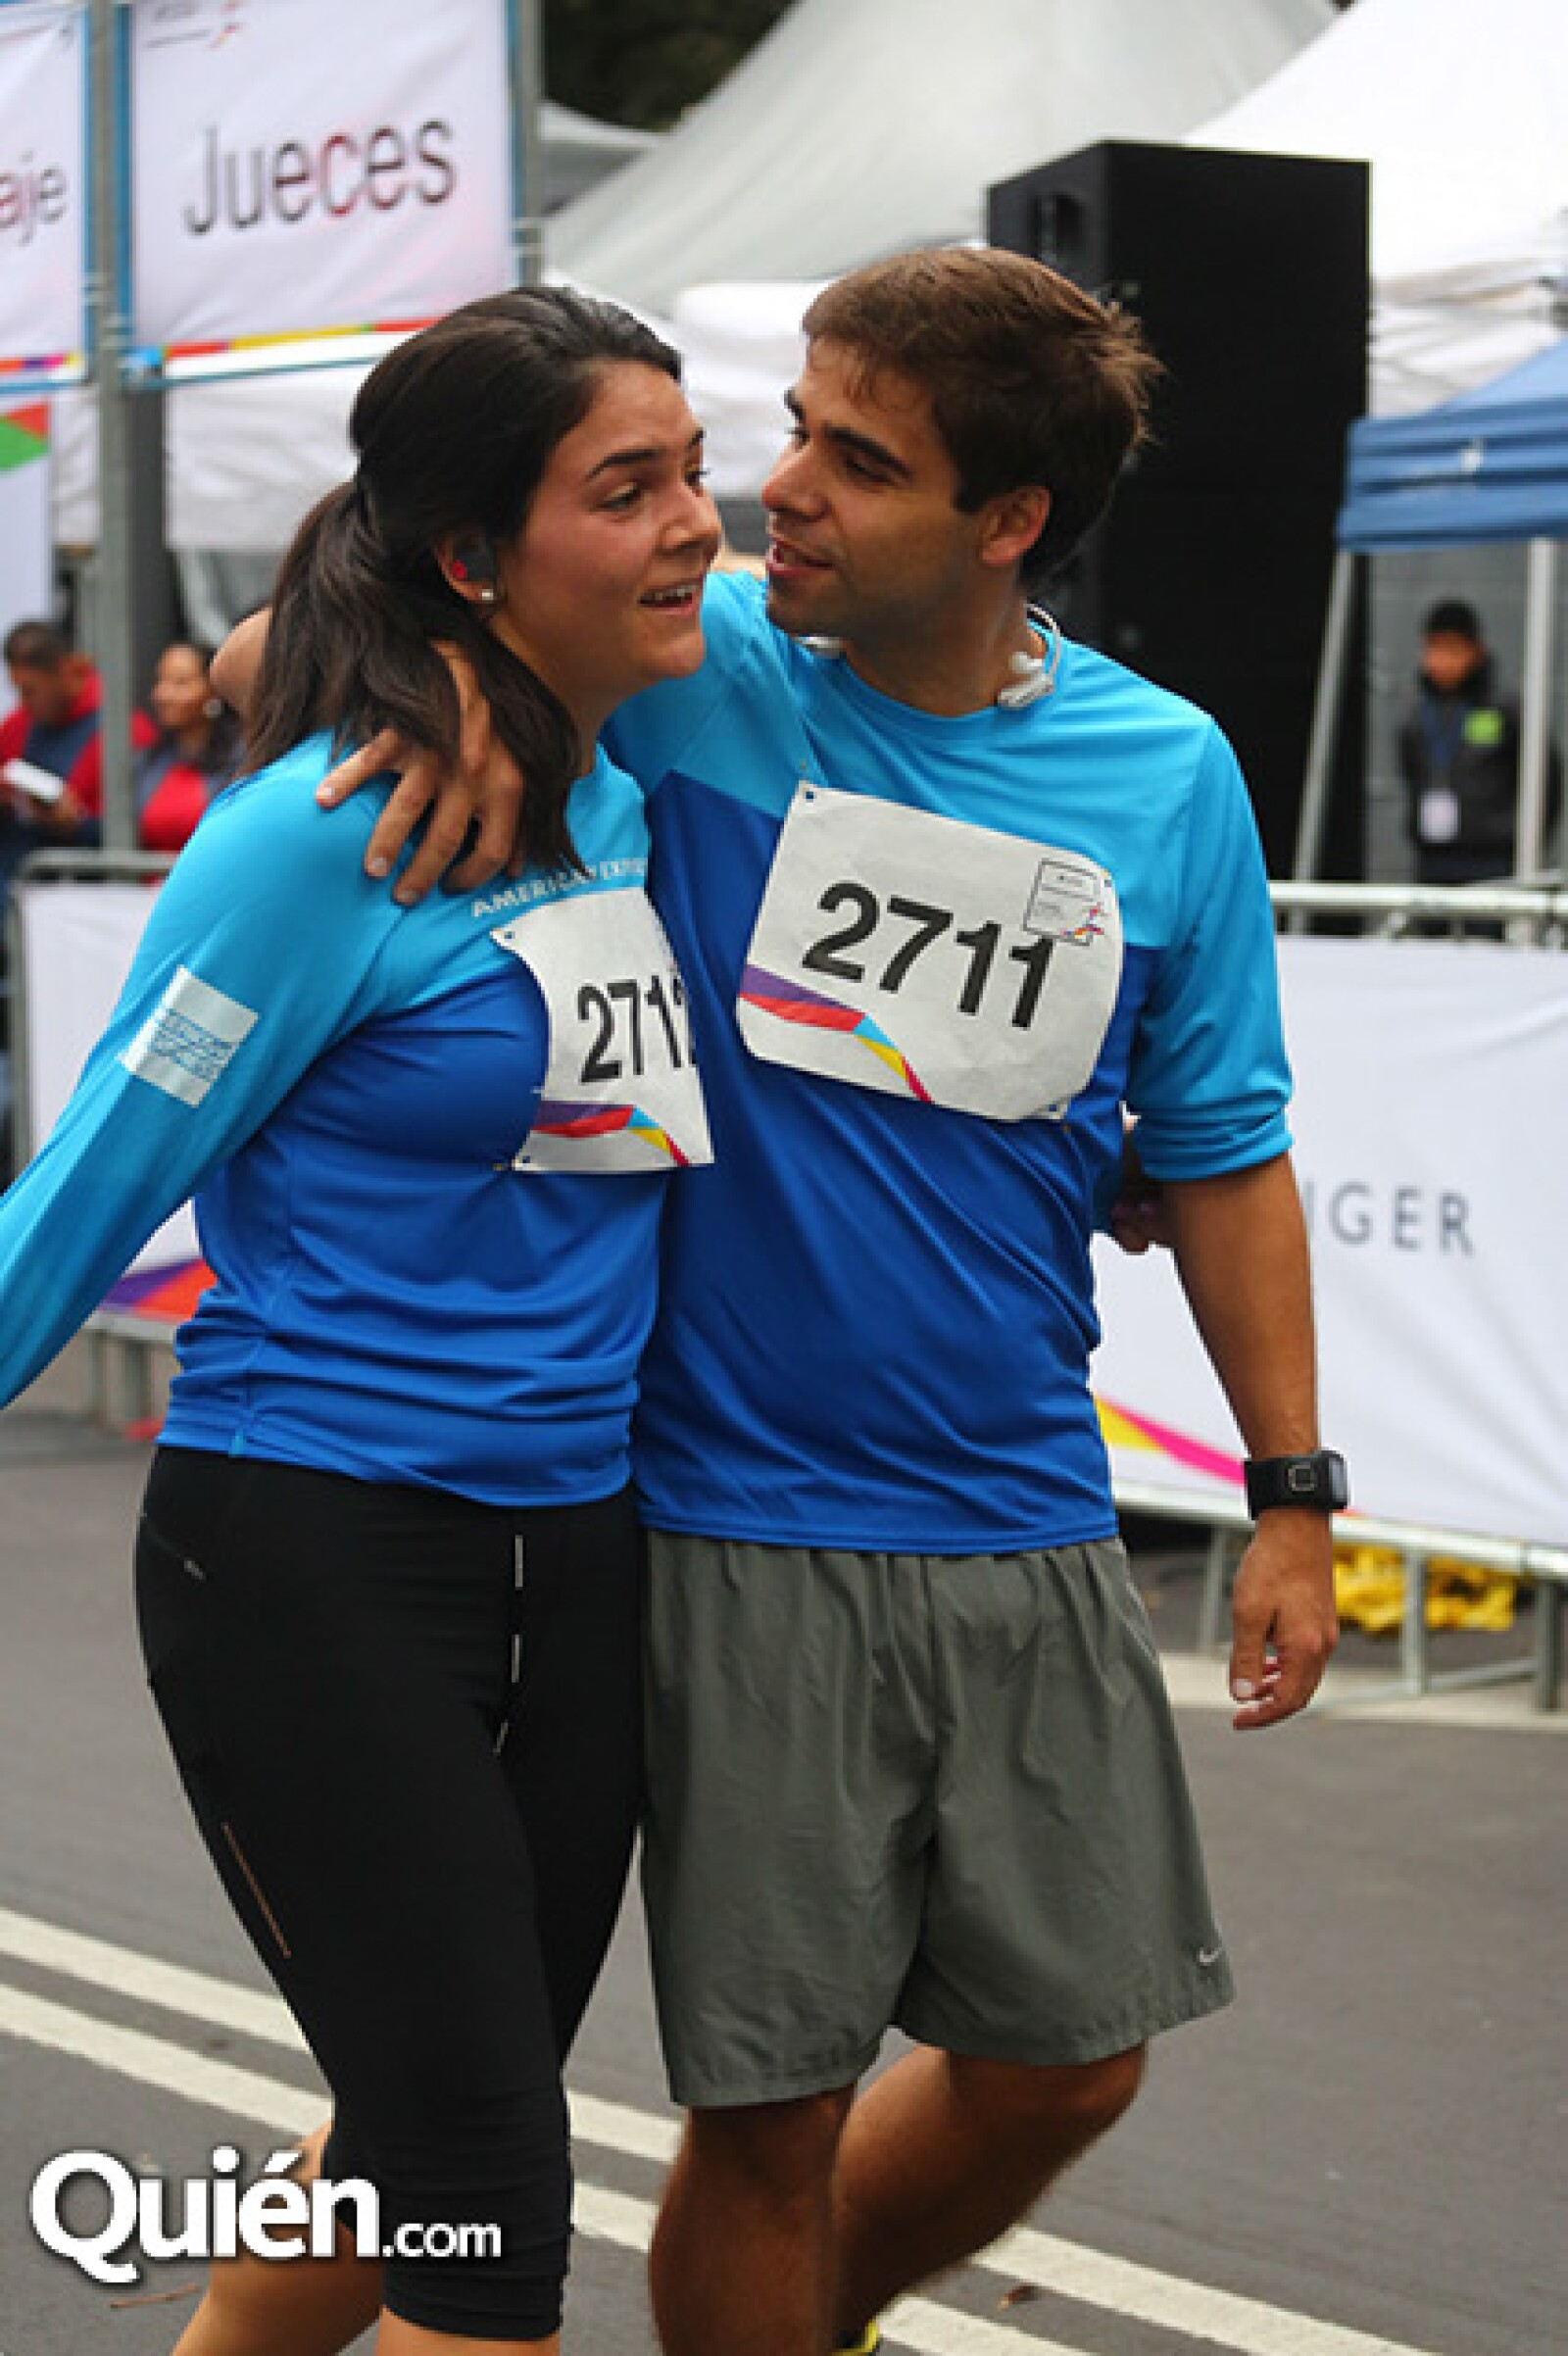 Inés Carral y Manuel Pereira